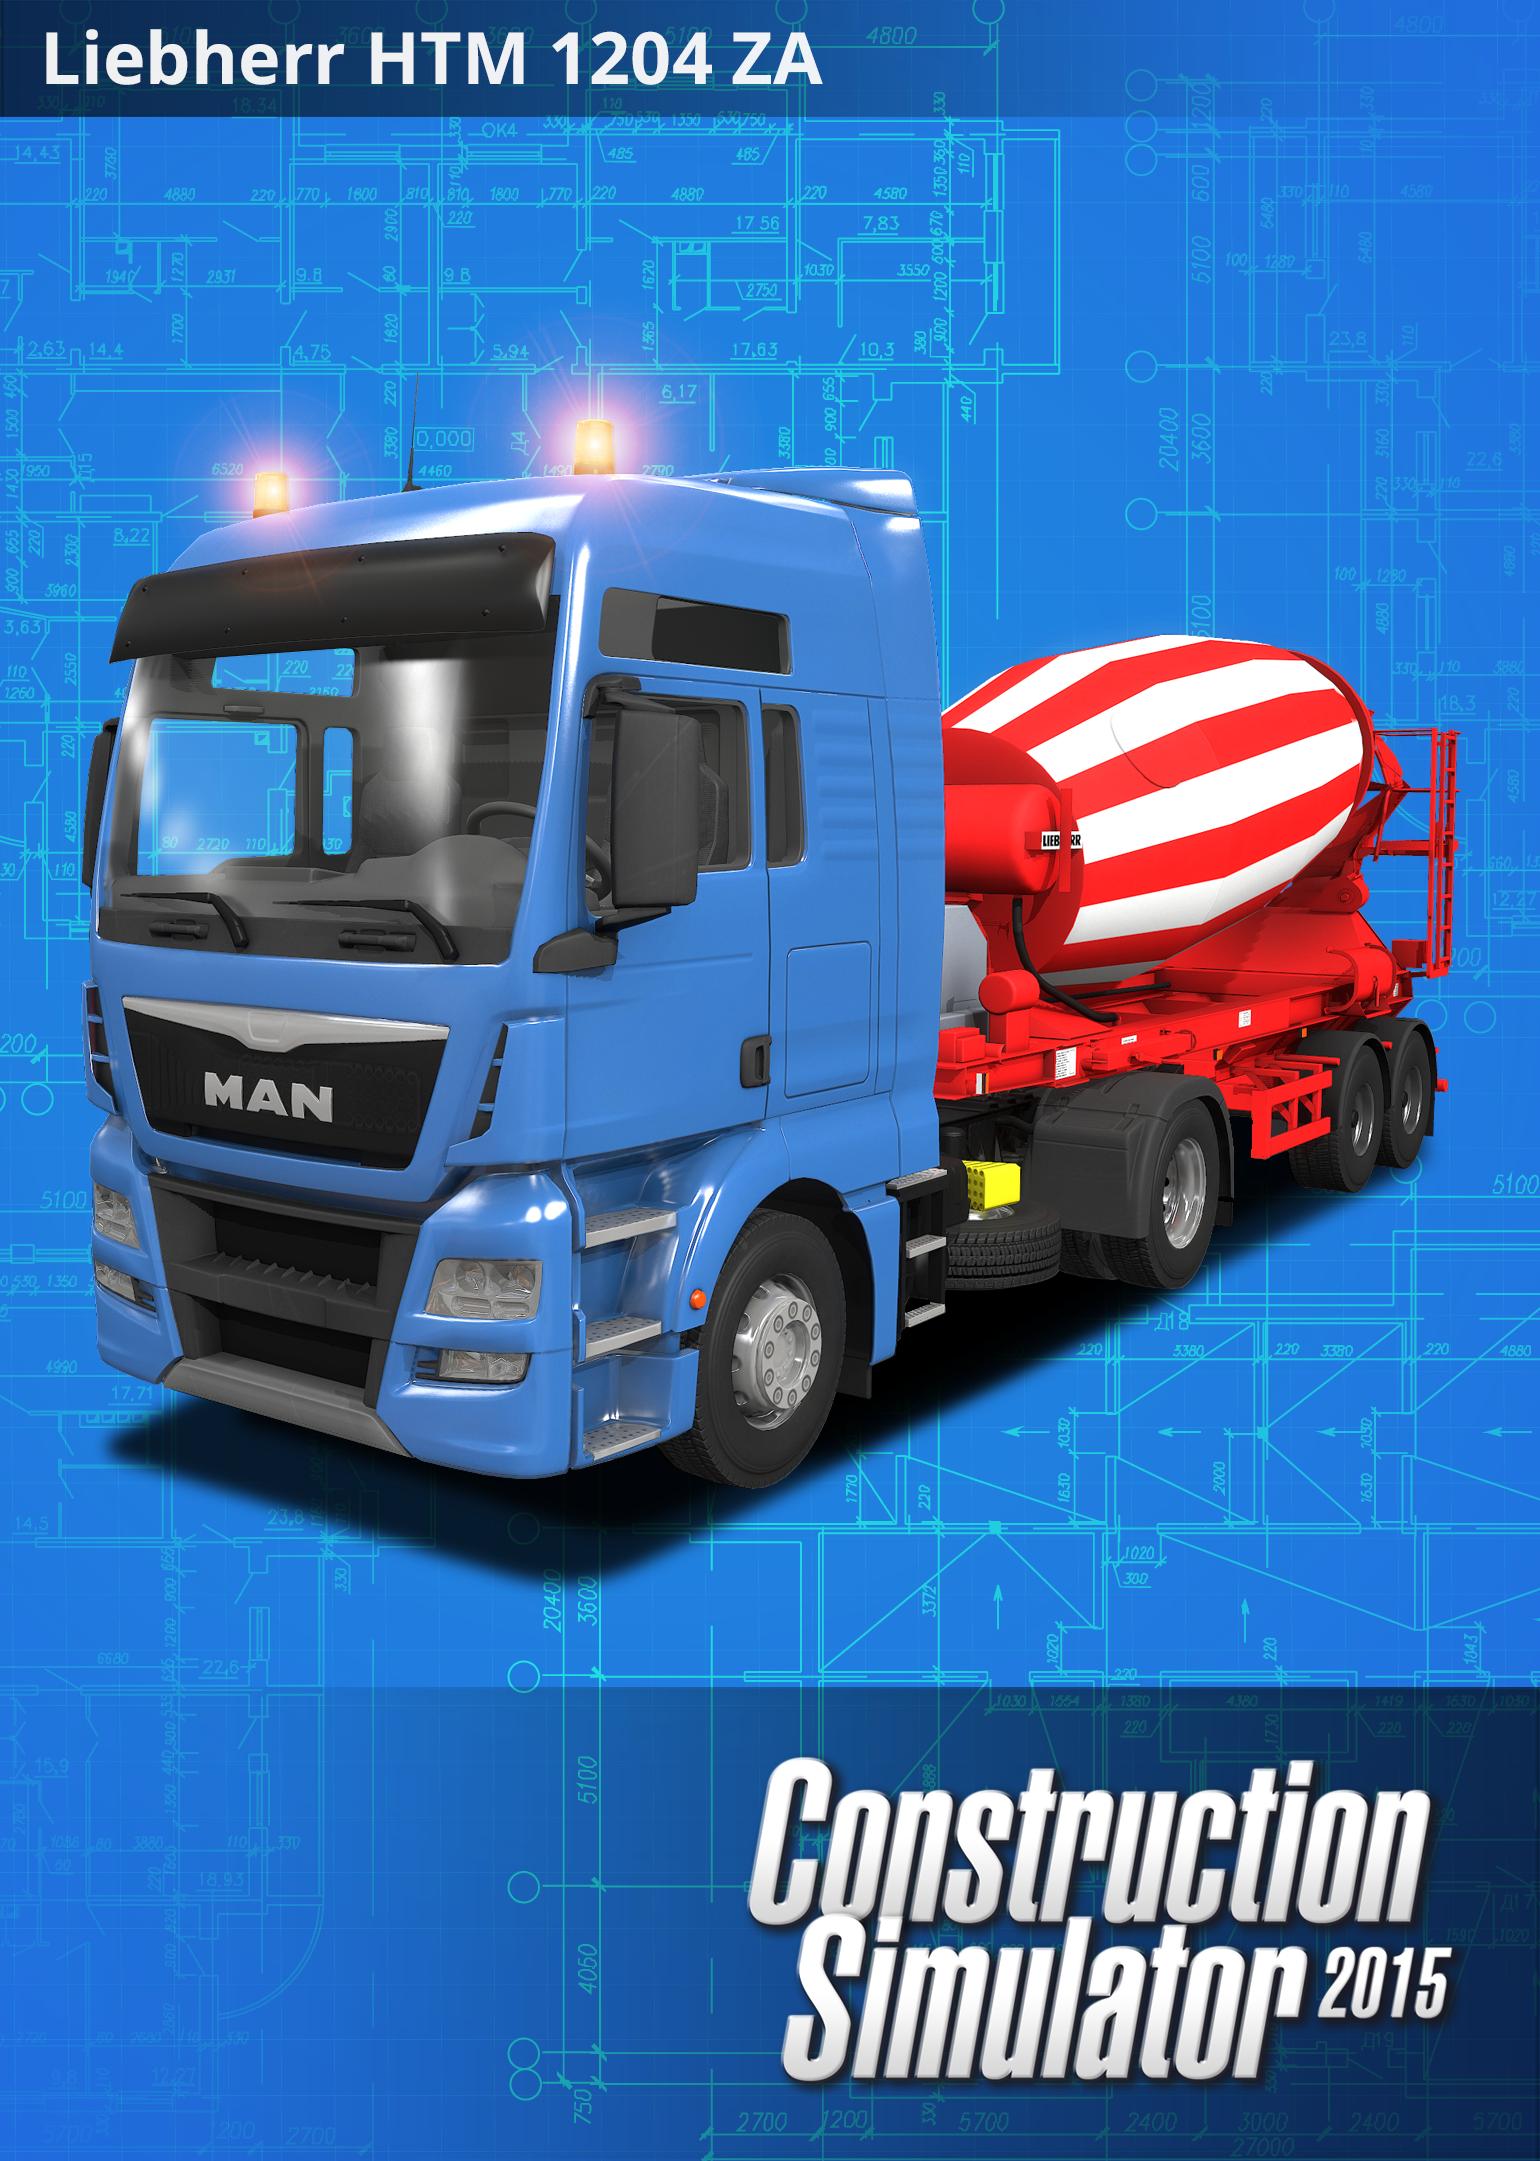 Construction Simulator 2015: LIEBHERR HTM 1204 ZA [Online Game Code] (Construction Simulator Steam compare prices)